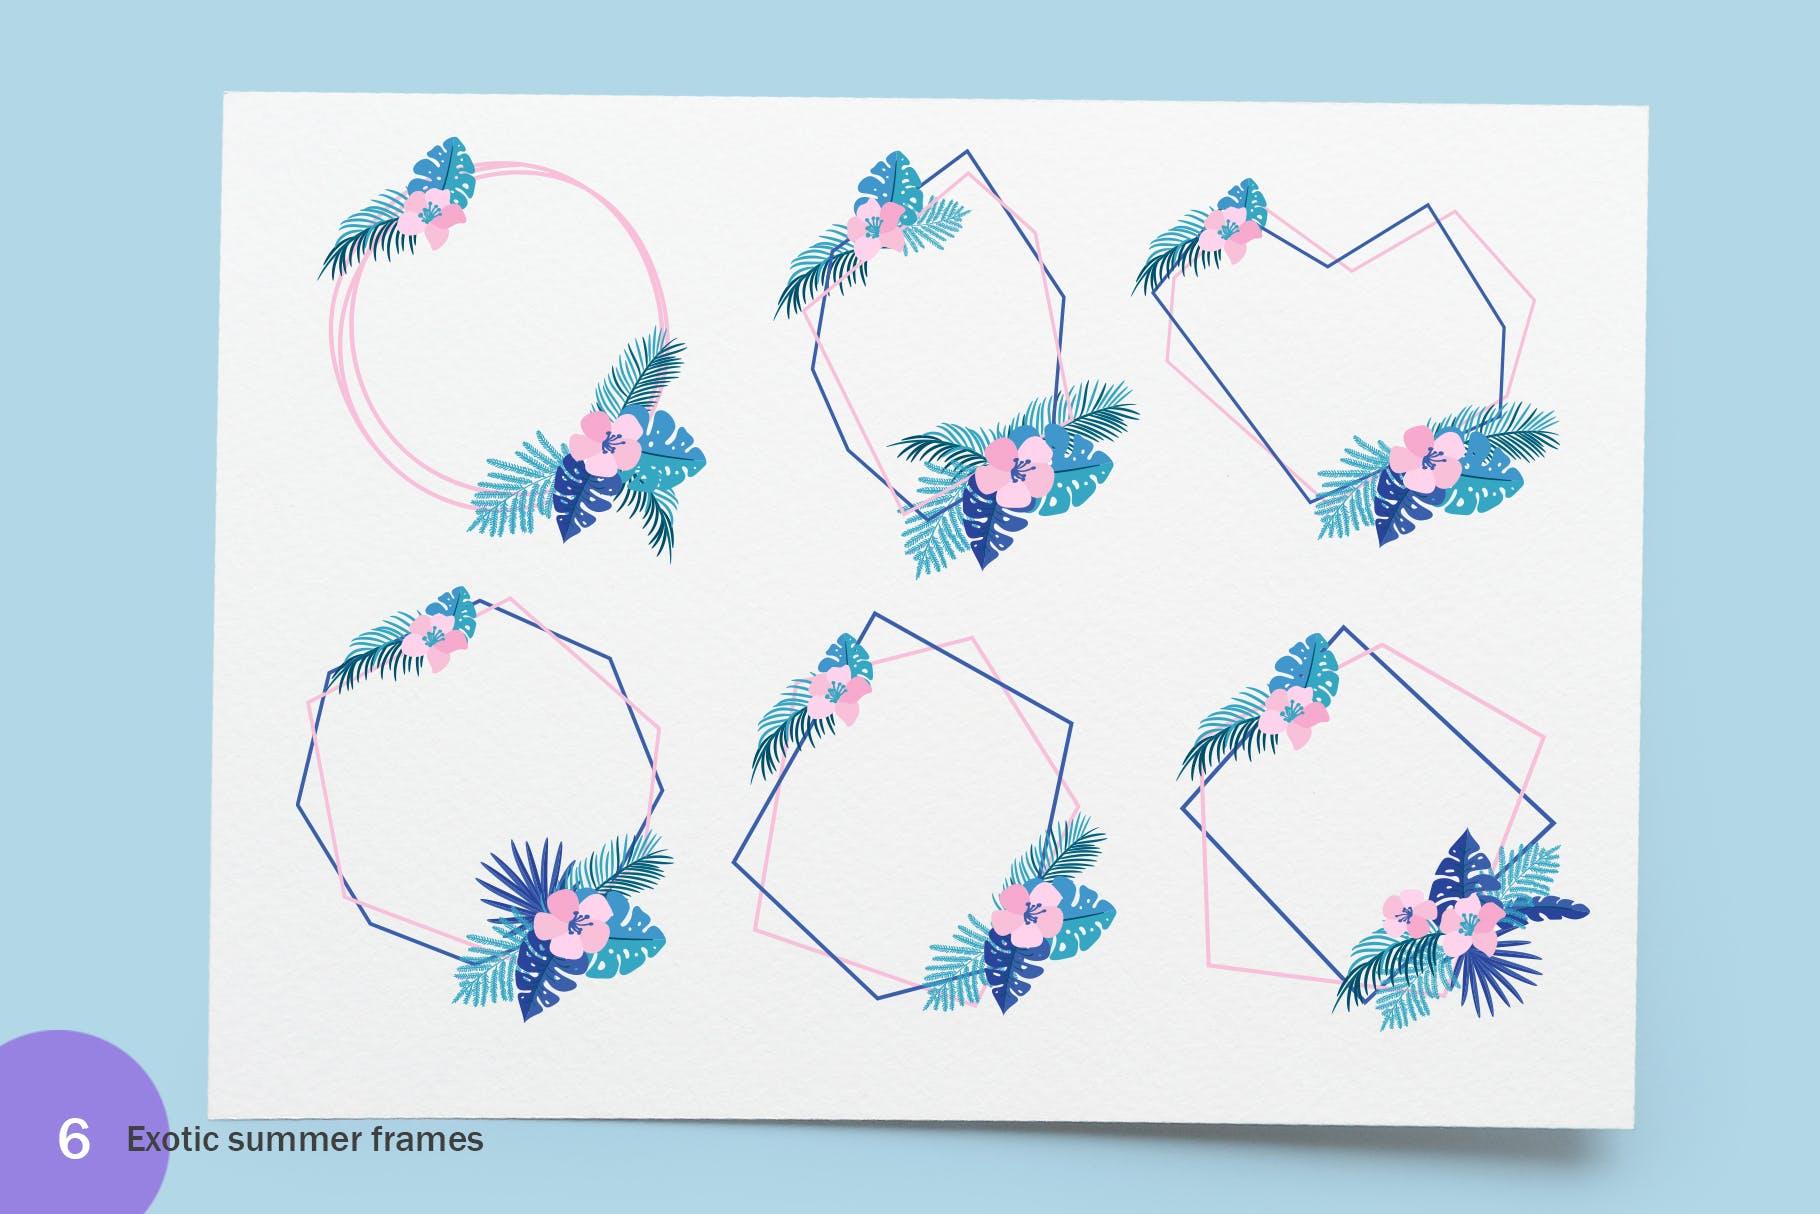 6个夏季无缝矢量图案素材图案纹理Summer Exotic Palm Design Elements SVG插图(2)